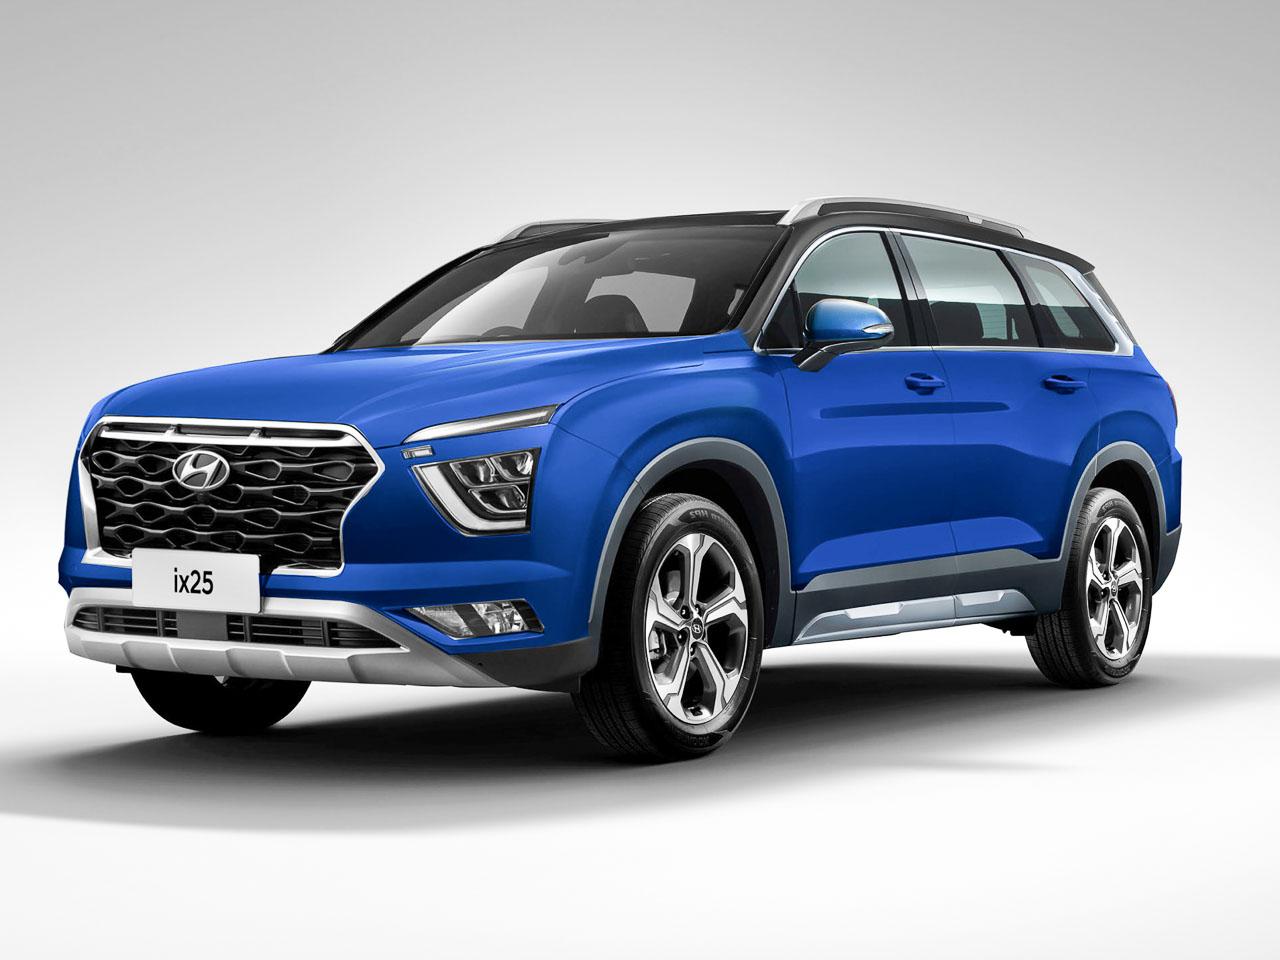 2021 Hyundai Creta Grand